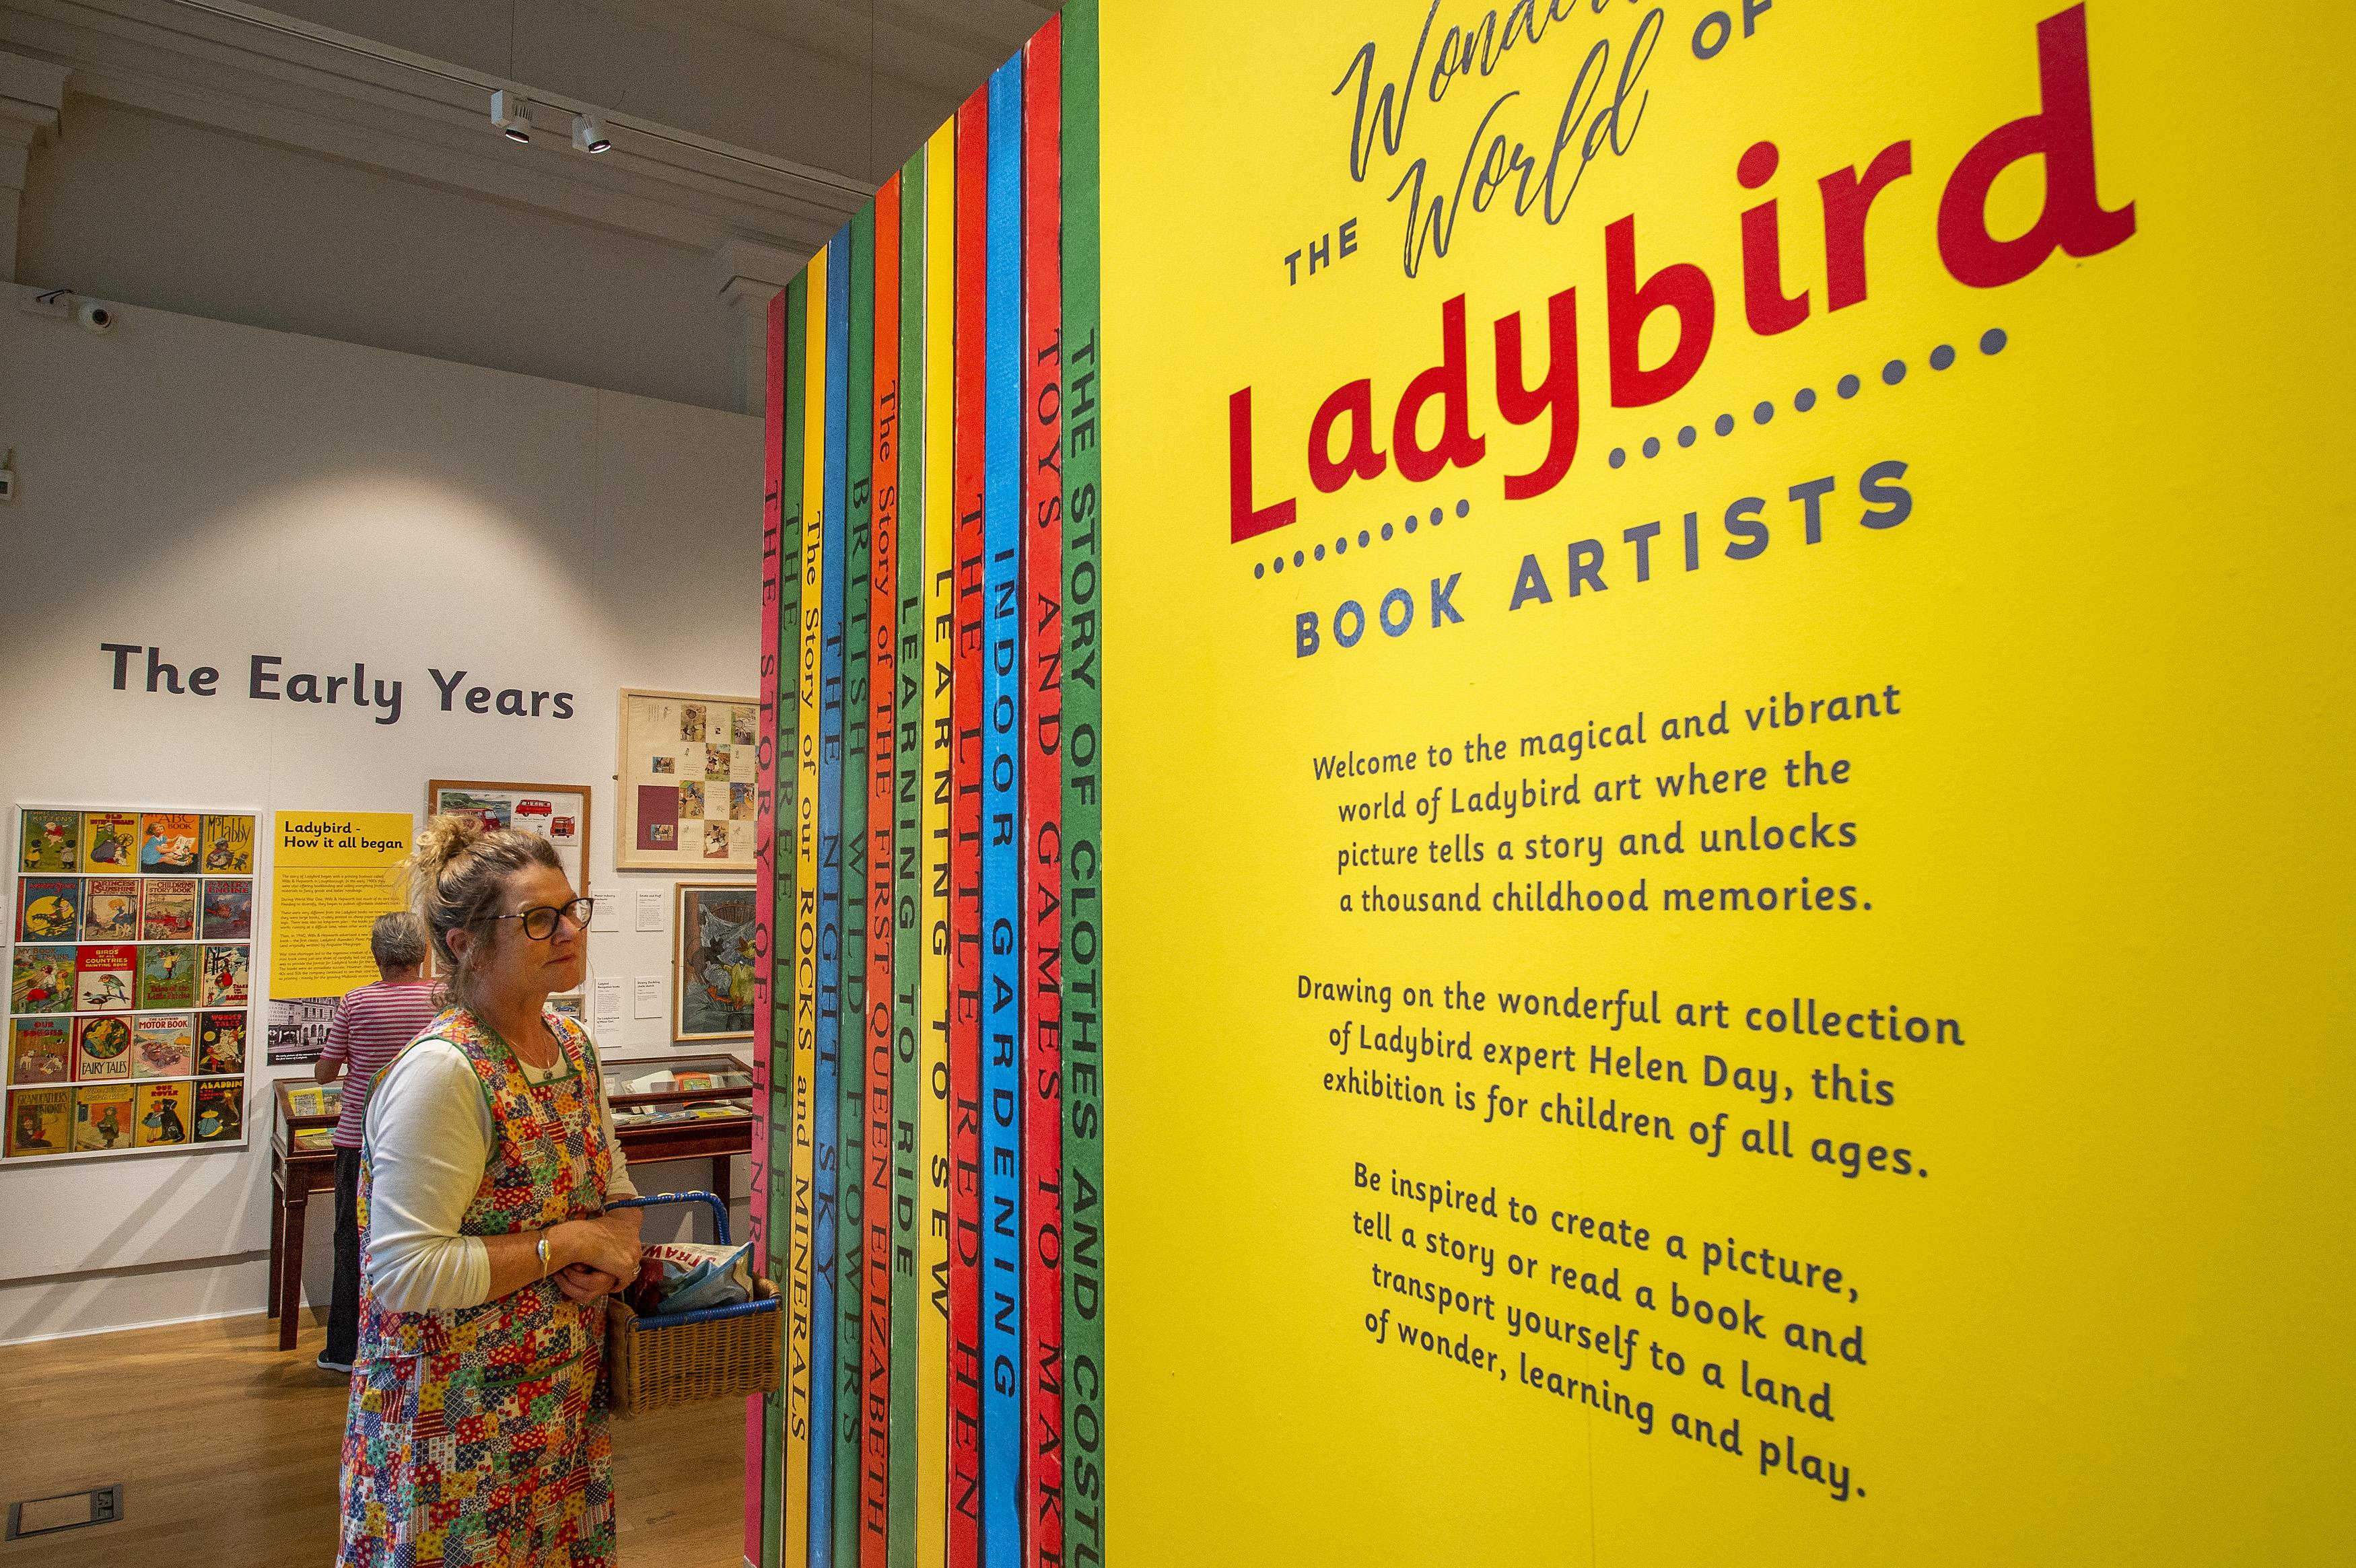 ladybird books leicester